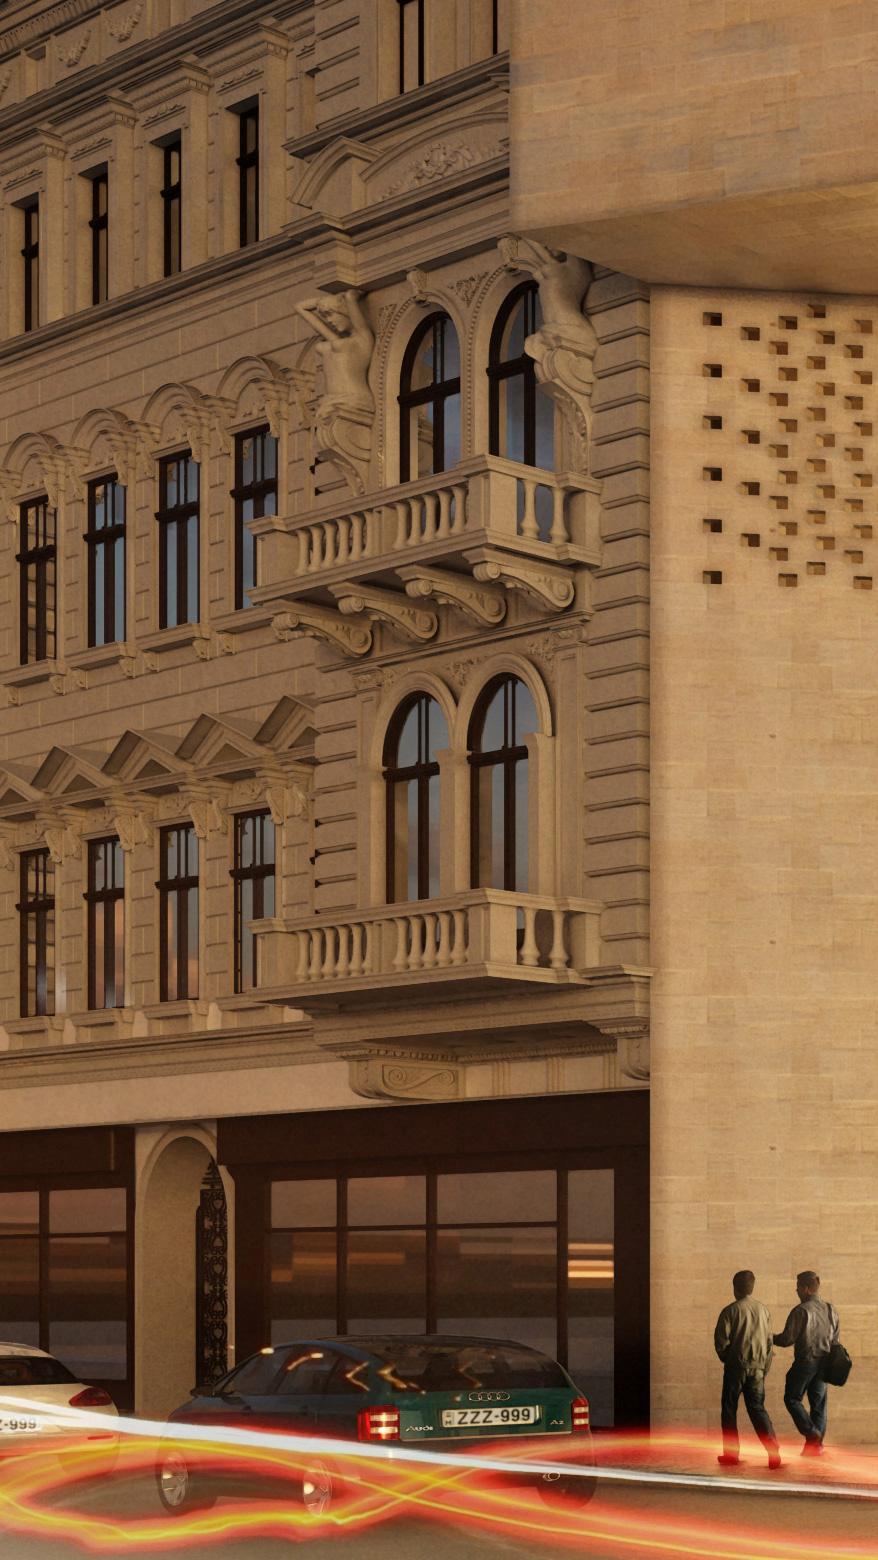 Flashforward - Central European University Budapest